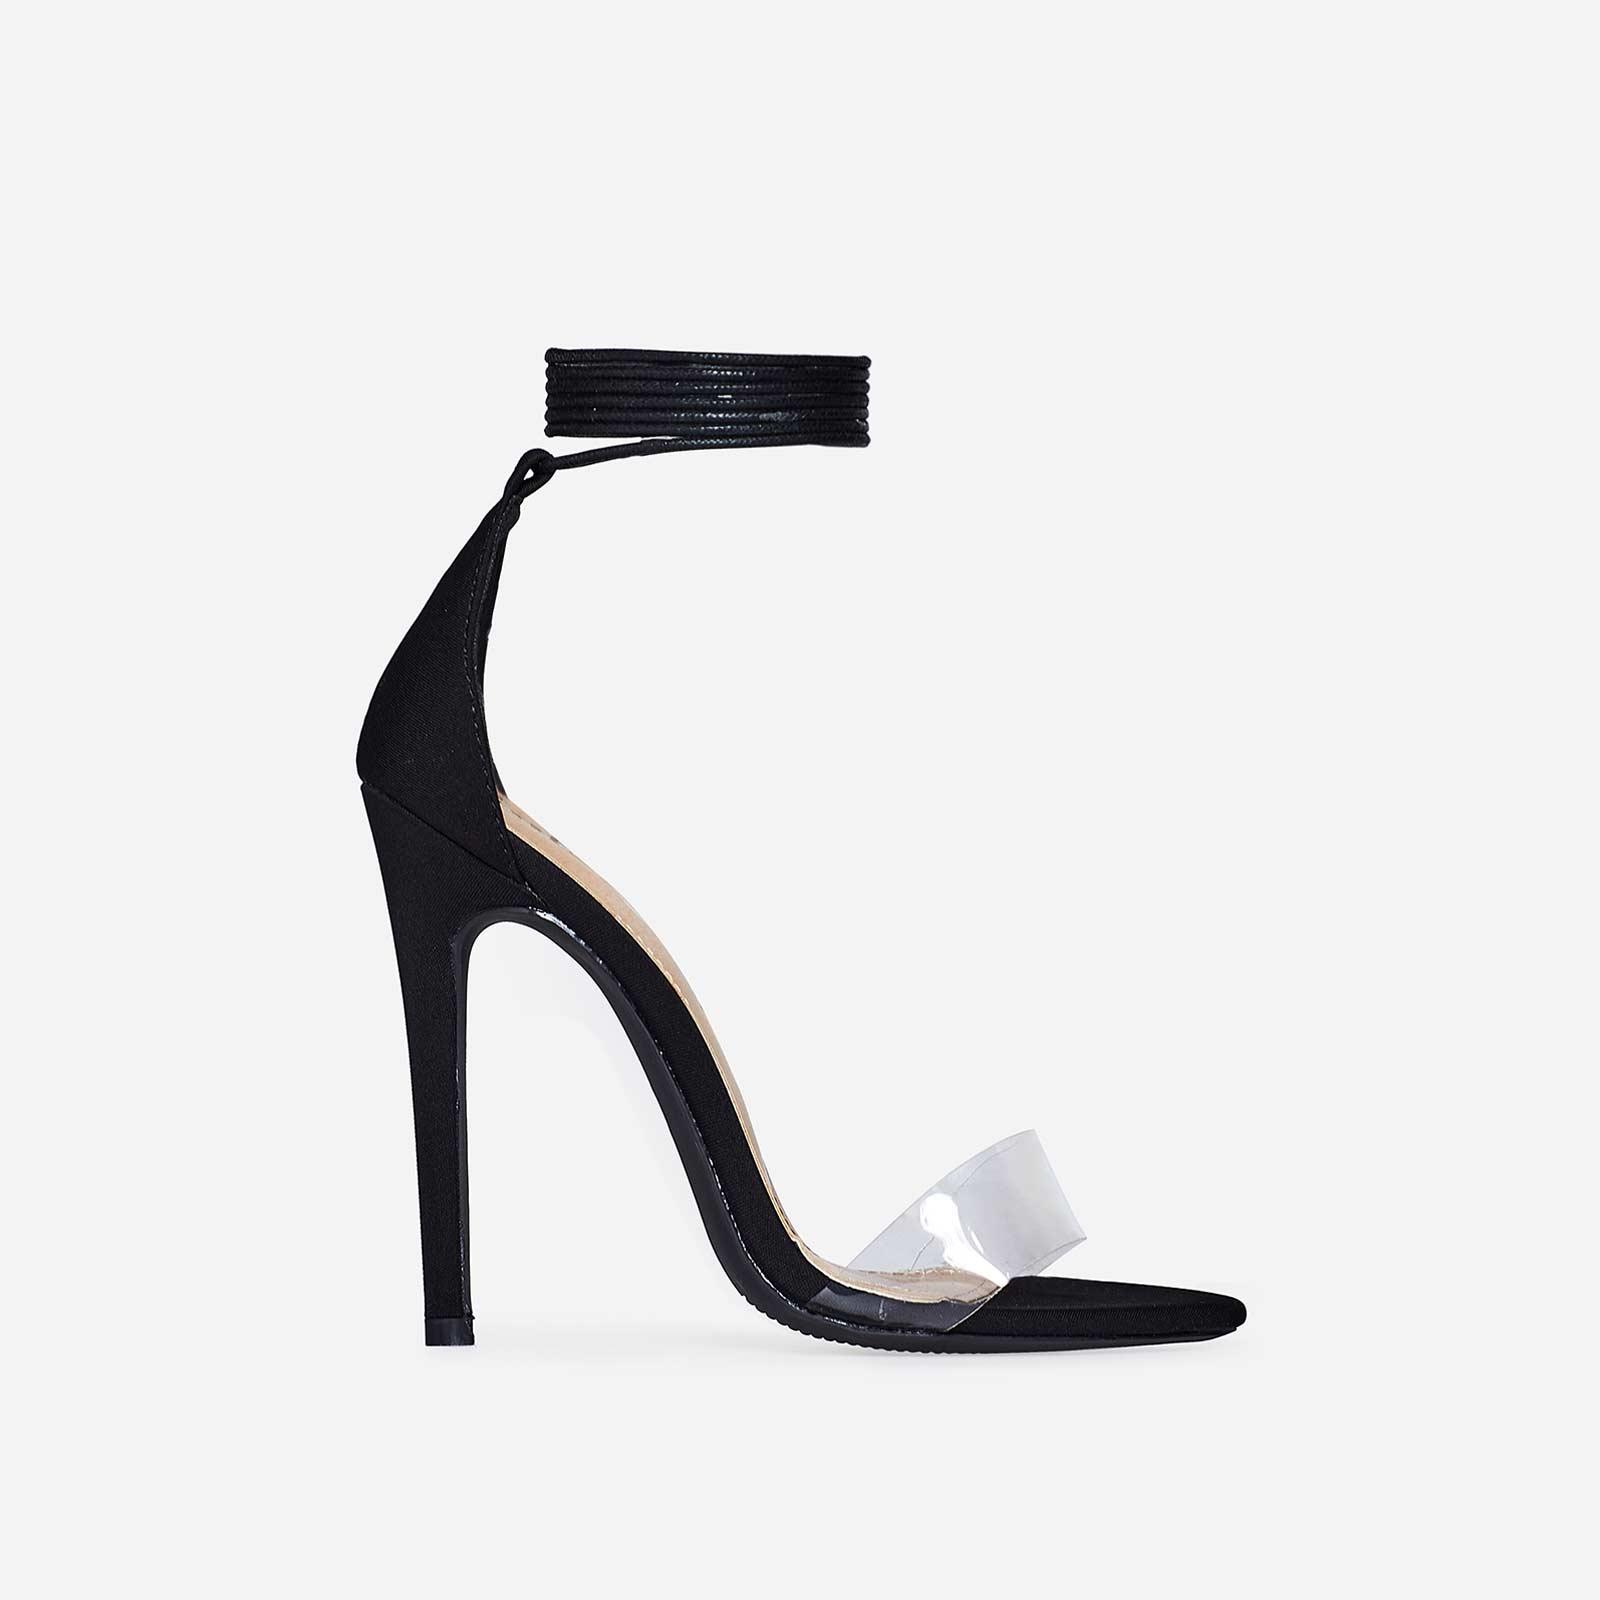 Perrie Lace Up Heel In Black Lycra